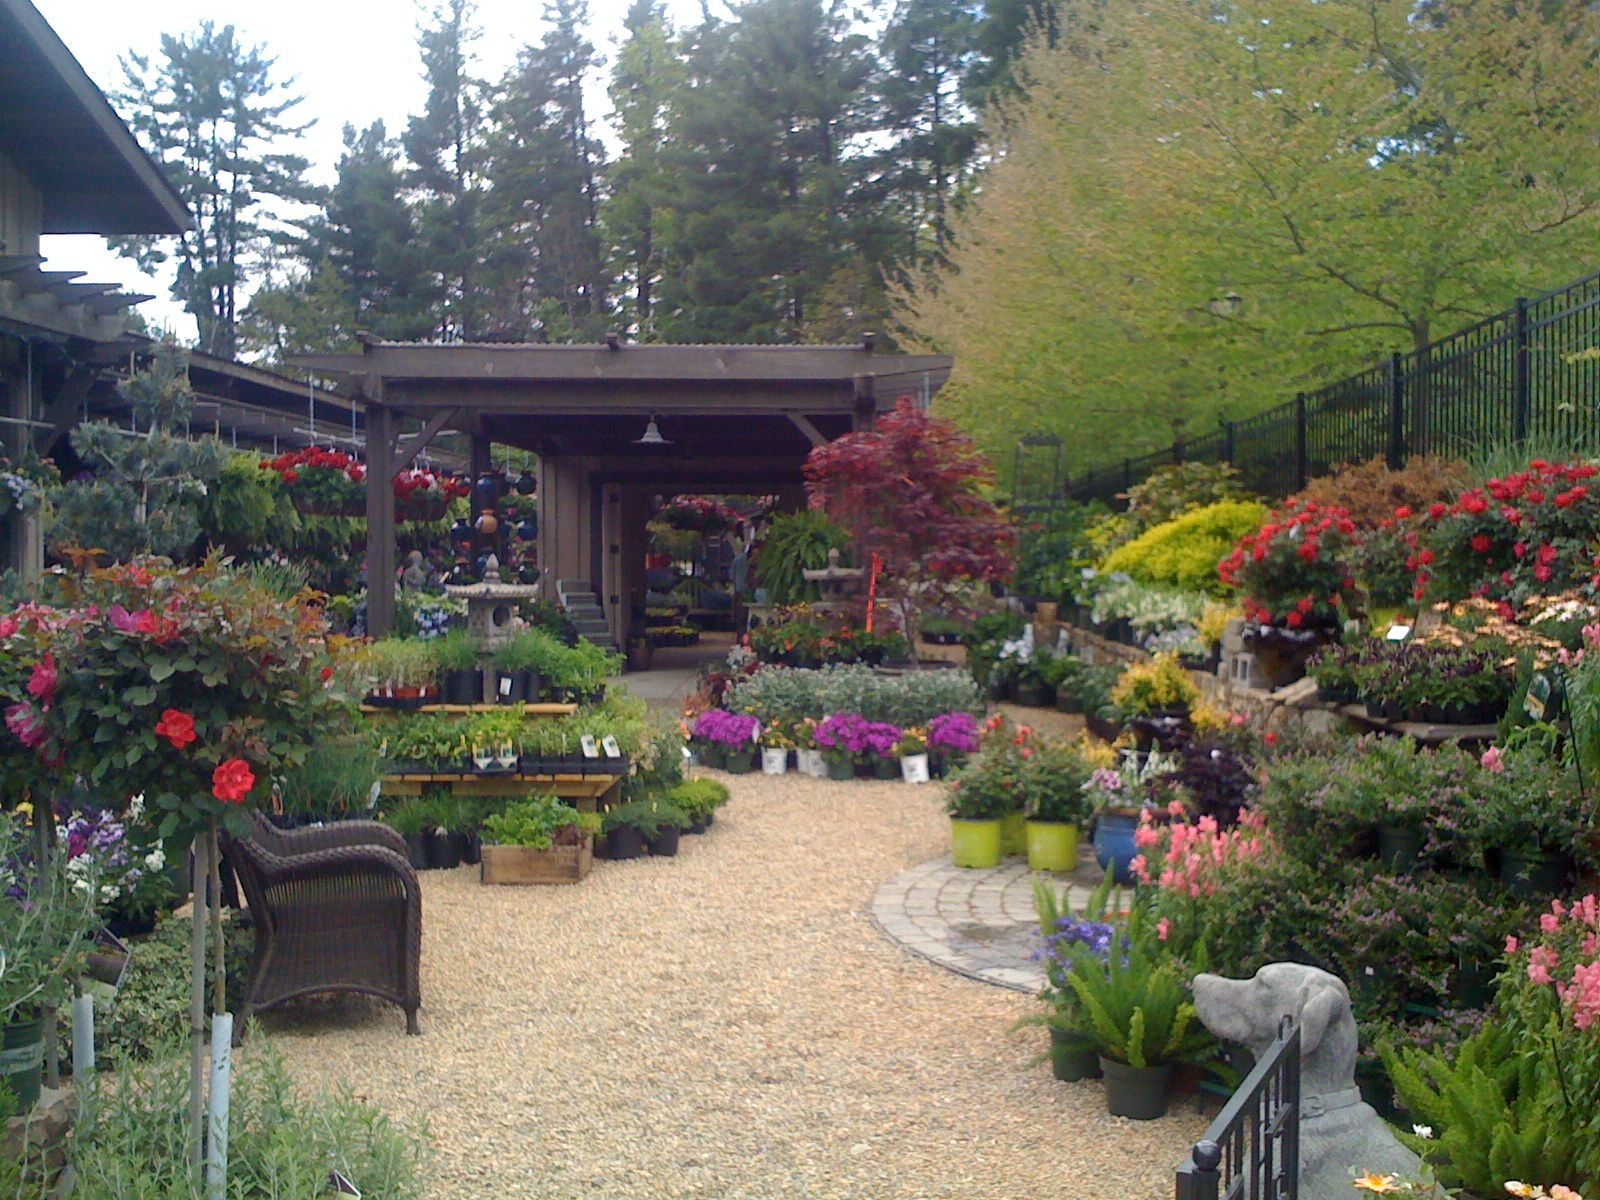 BB Barns Flower Market display, Brevard, NC Garden